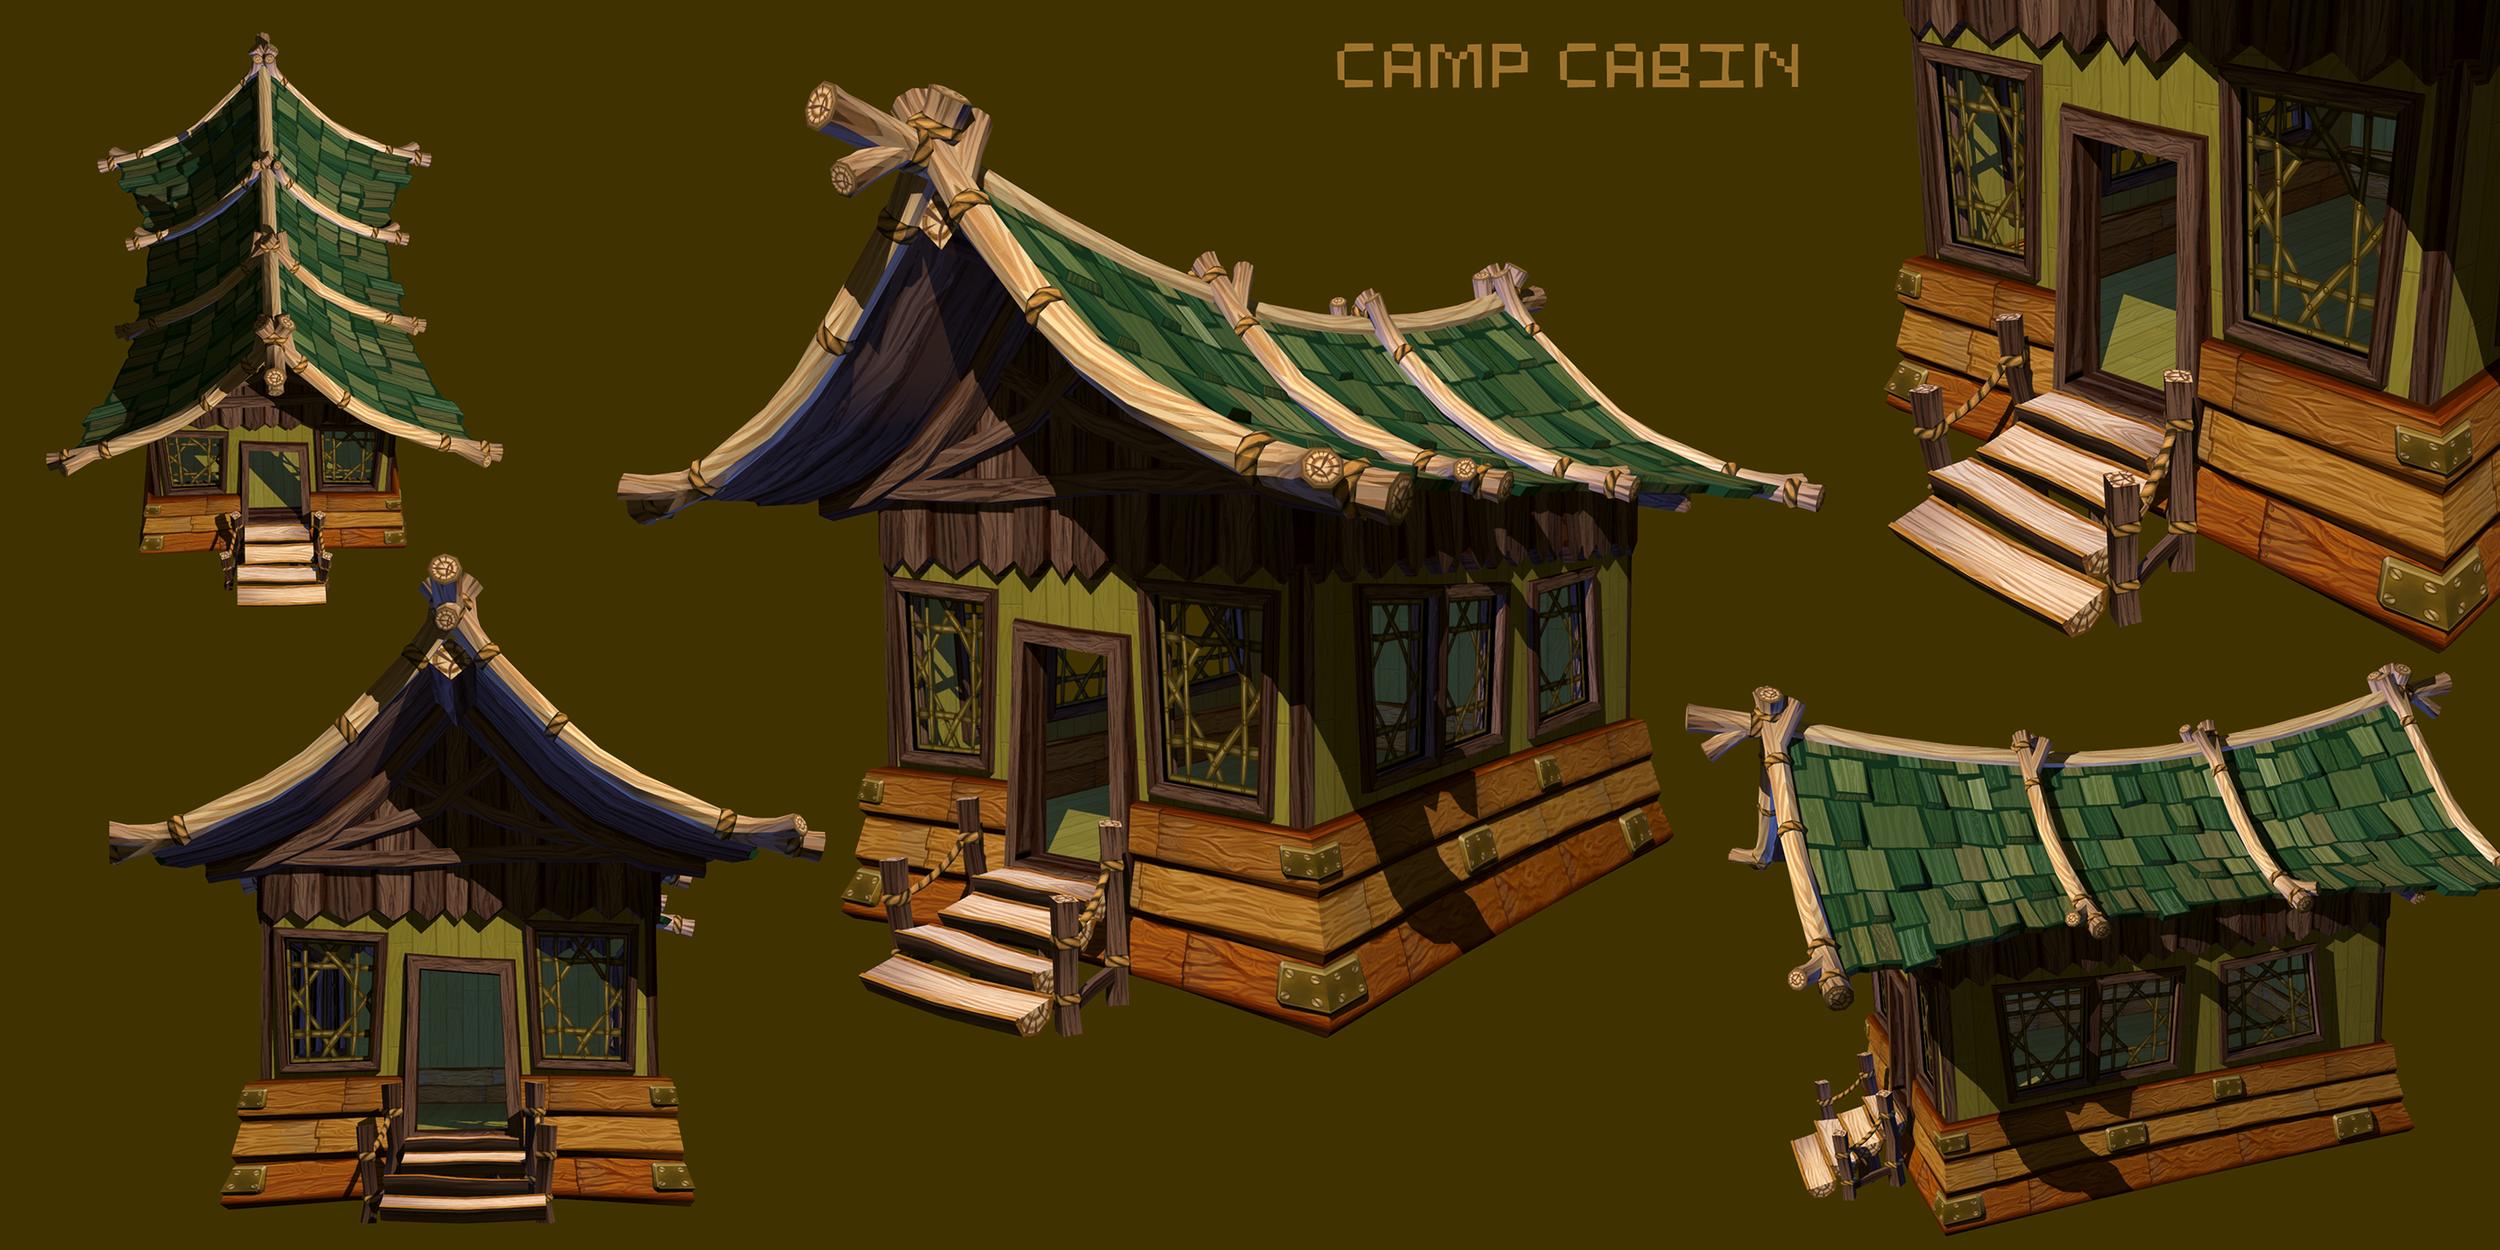 Psychonauts2 Prototype - Cabin